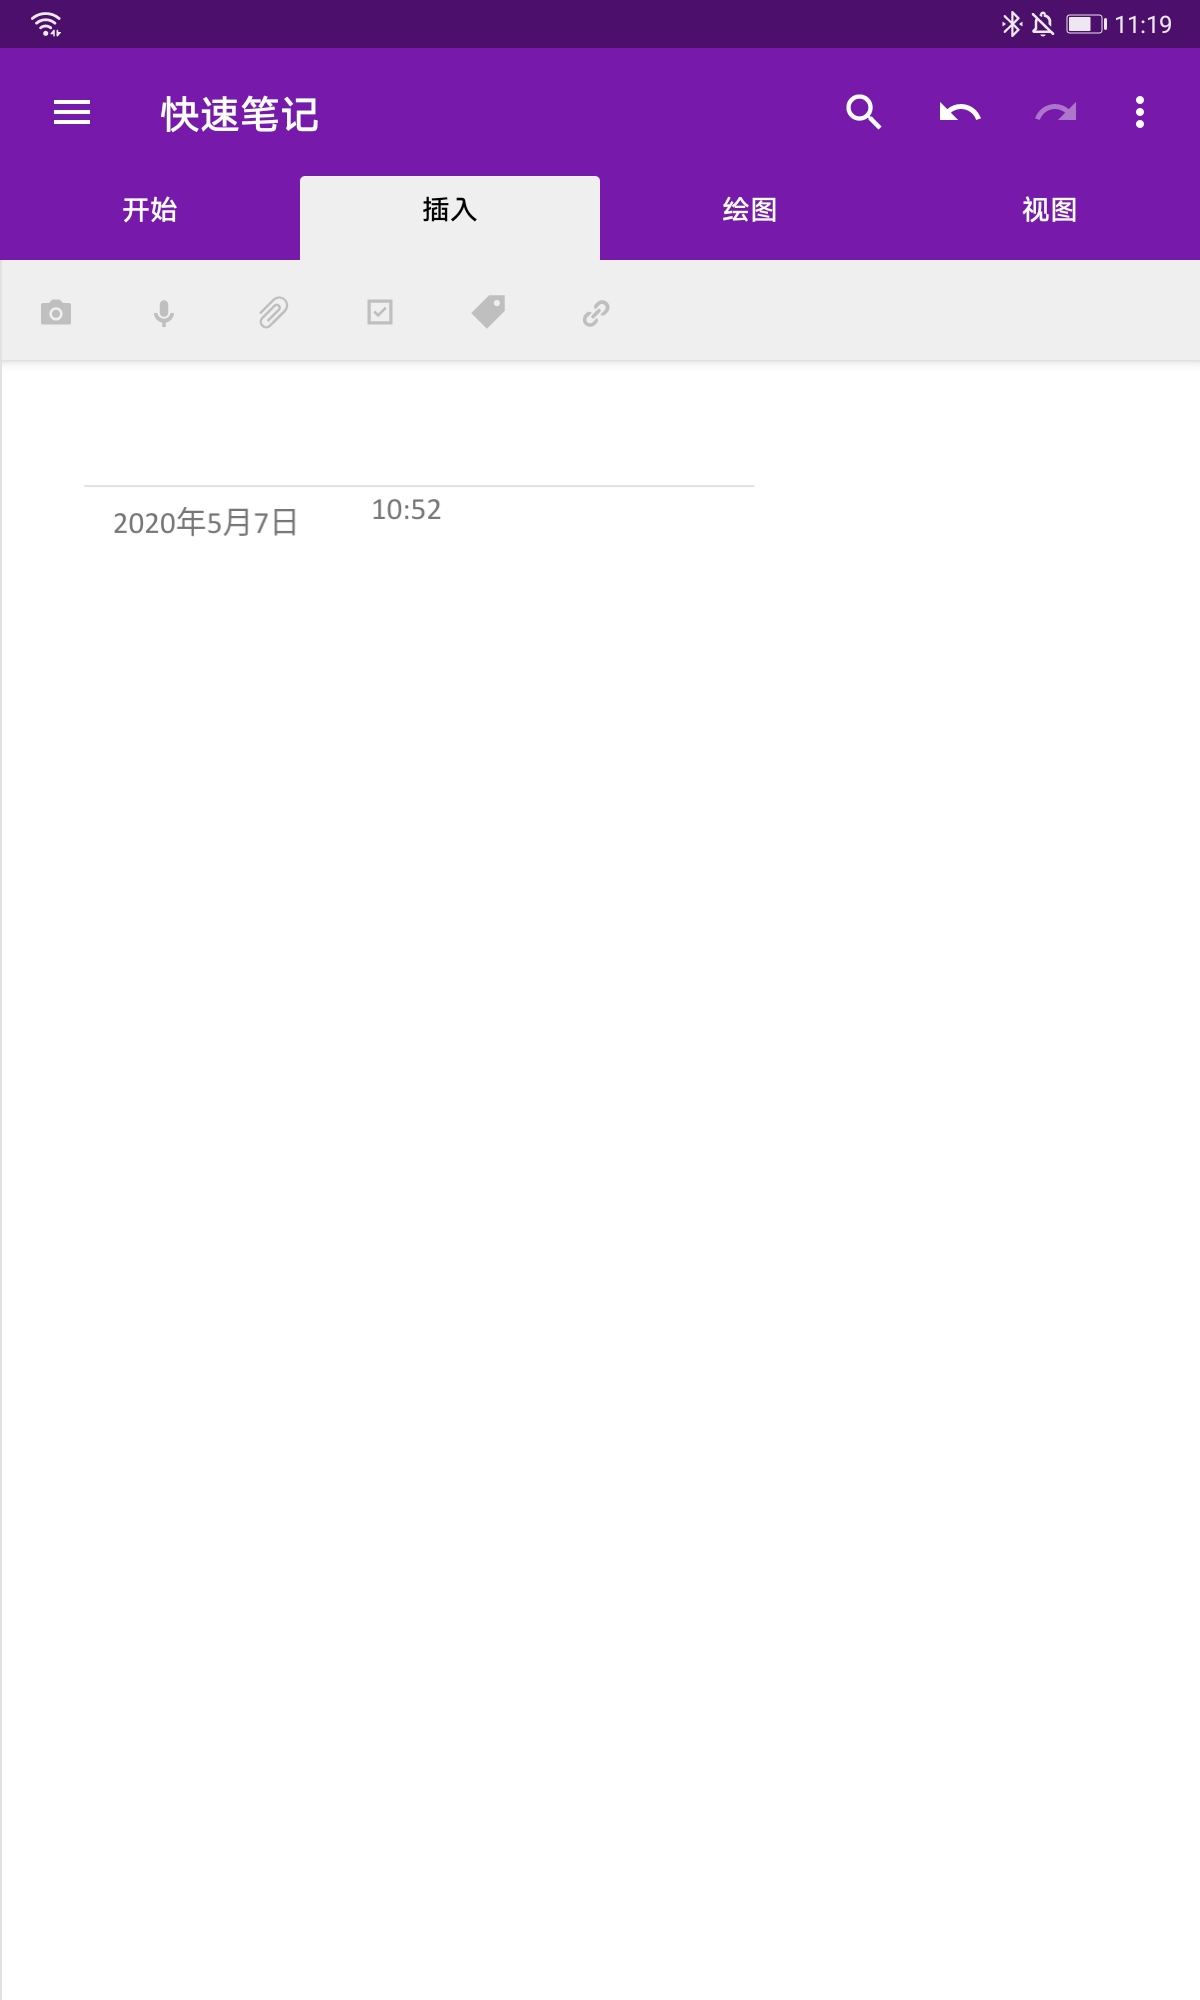 Screenshot_20200507_111947_com.microsoft.office.onenote.jpg